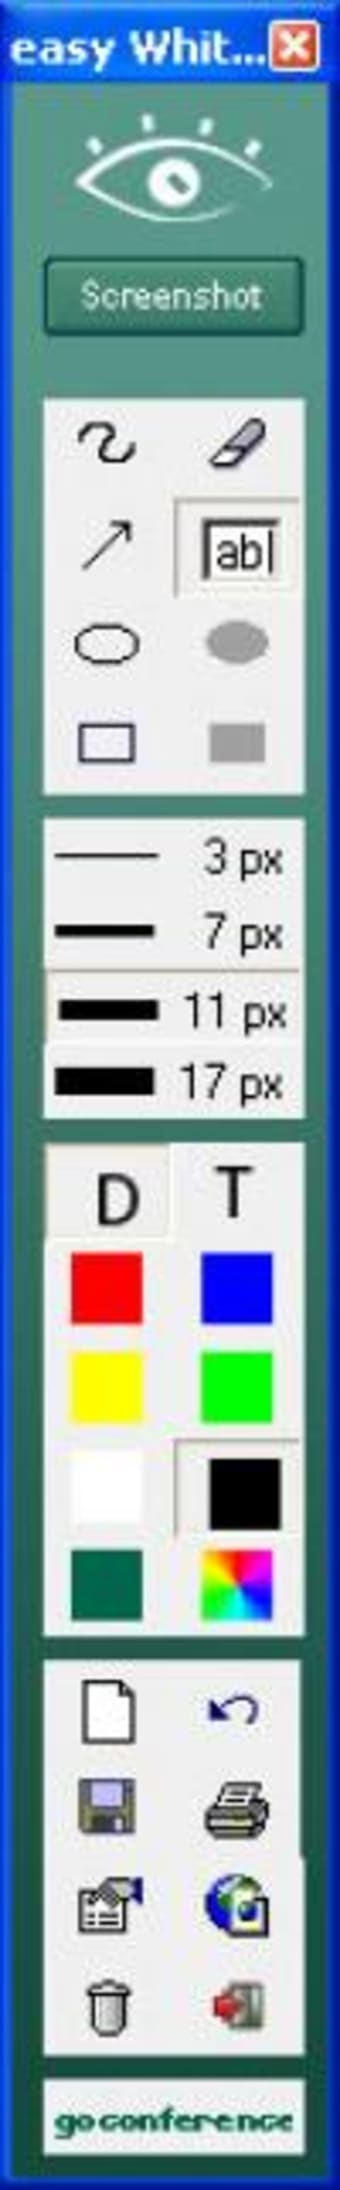 Easy Whiteboard